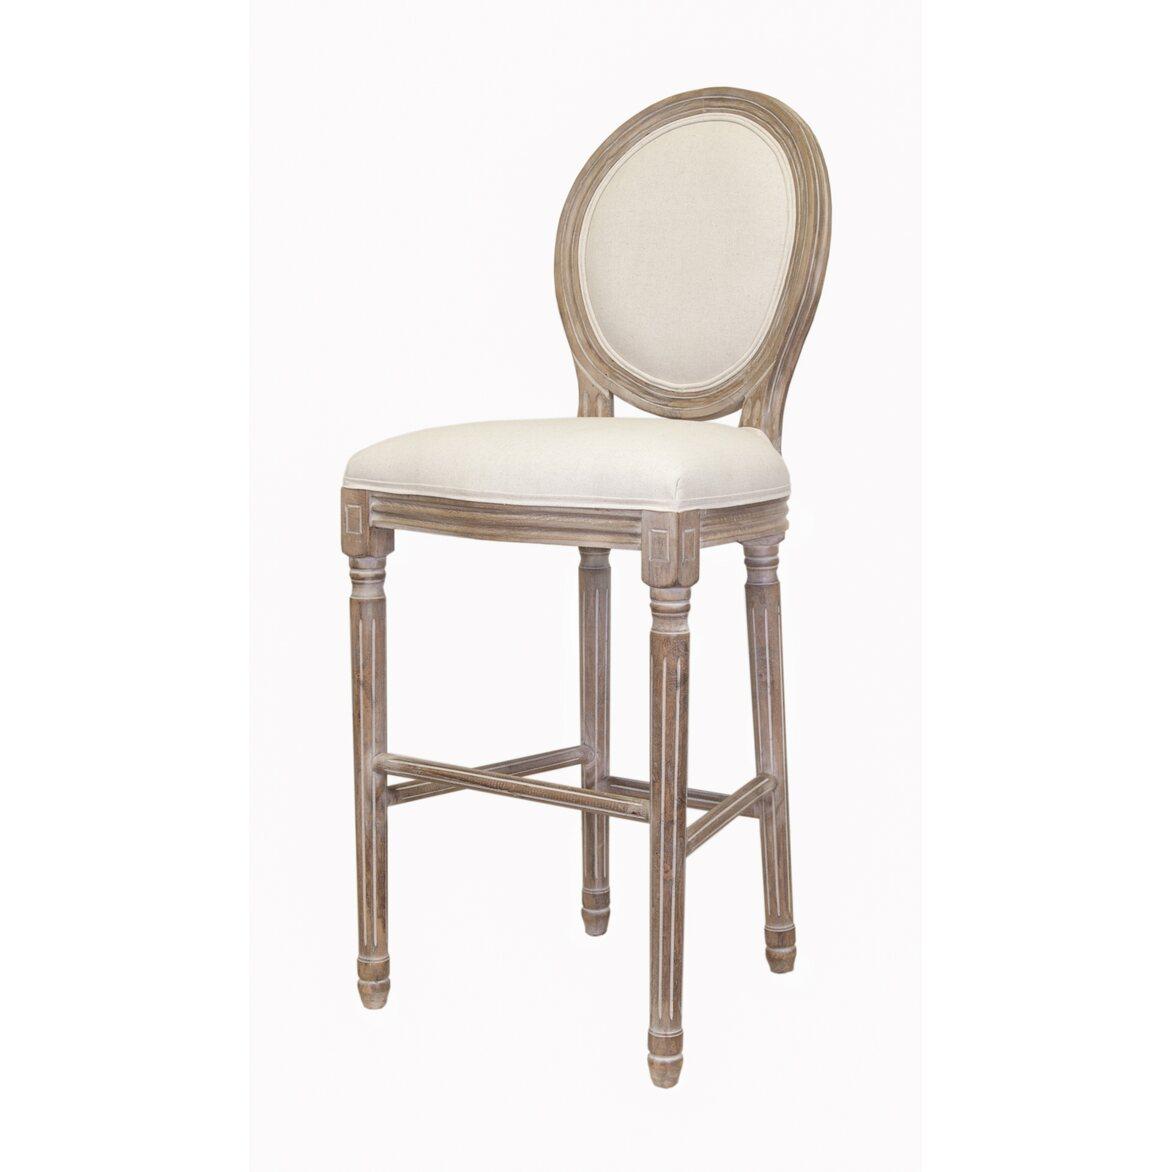 Барный стул Filon ver.2 4 | Барные стулья Kingsby